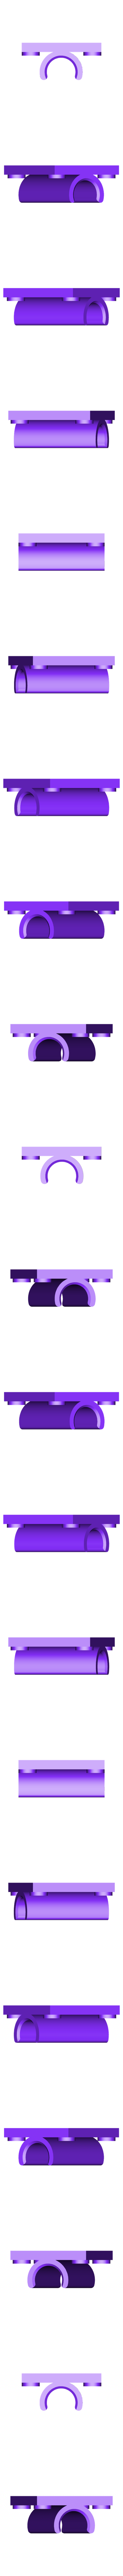 P&B_9.stl Download free STL file P & B ARMY (PIPE AND BOARD) • 3D printable model, DJER